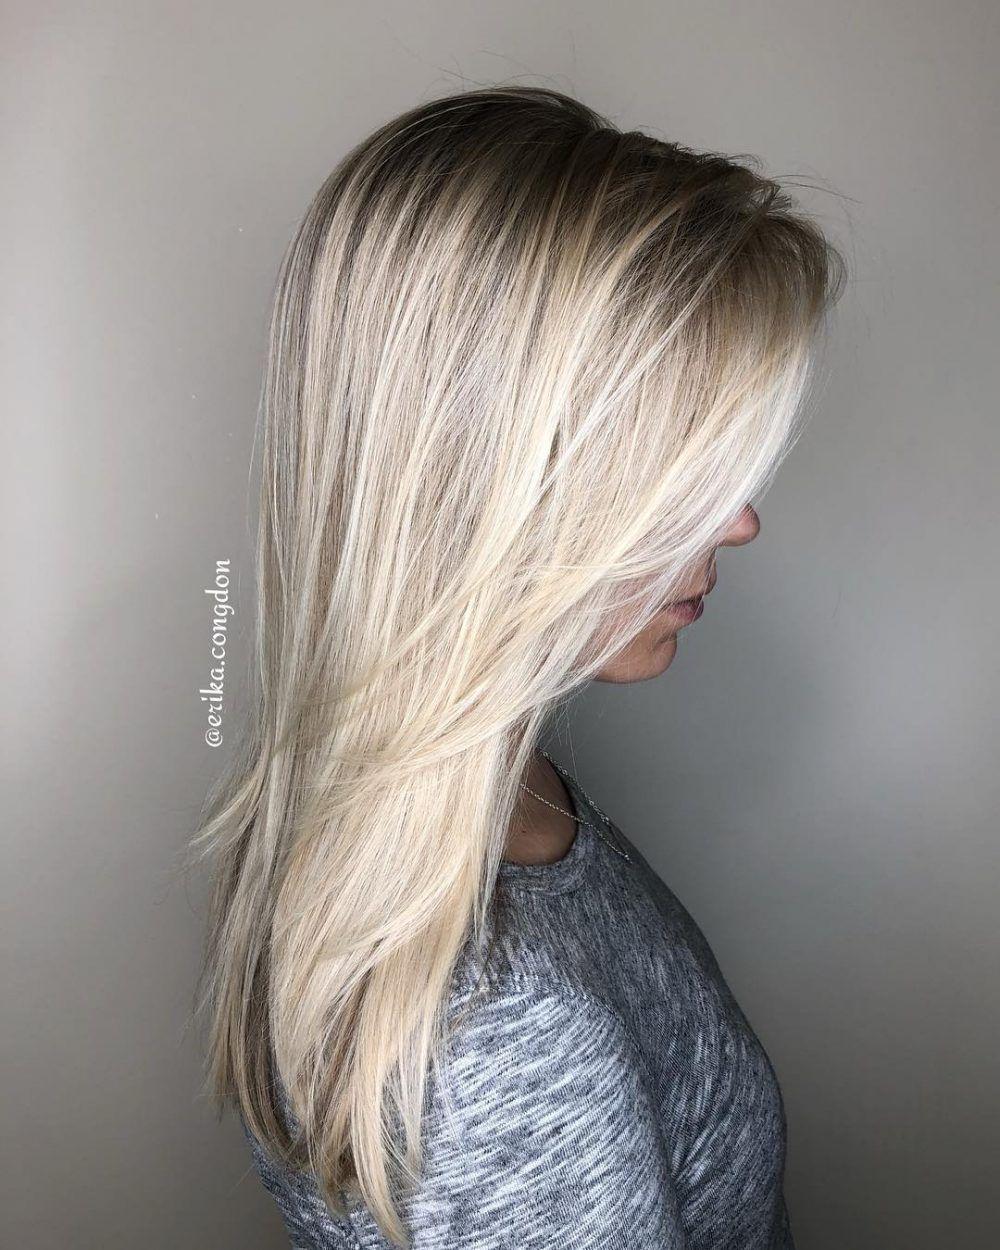 32 Volumizing Haircuts For Thin Long Hair Before After Makeovers Long Thin Hair Long Fine Hair Thin Hair Haircuts